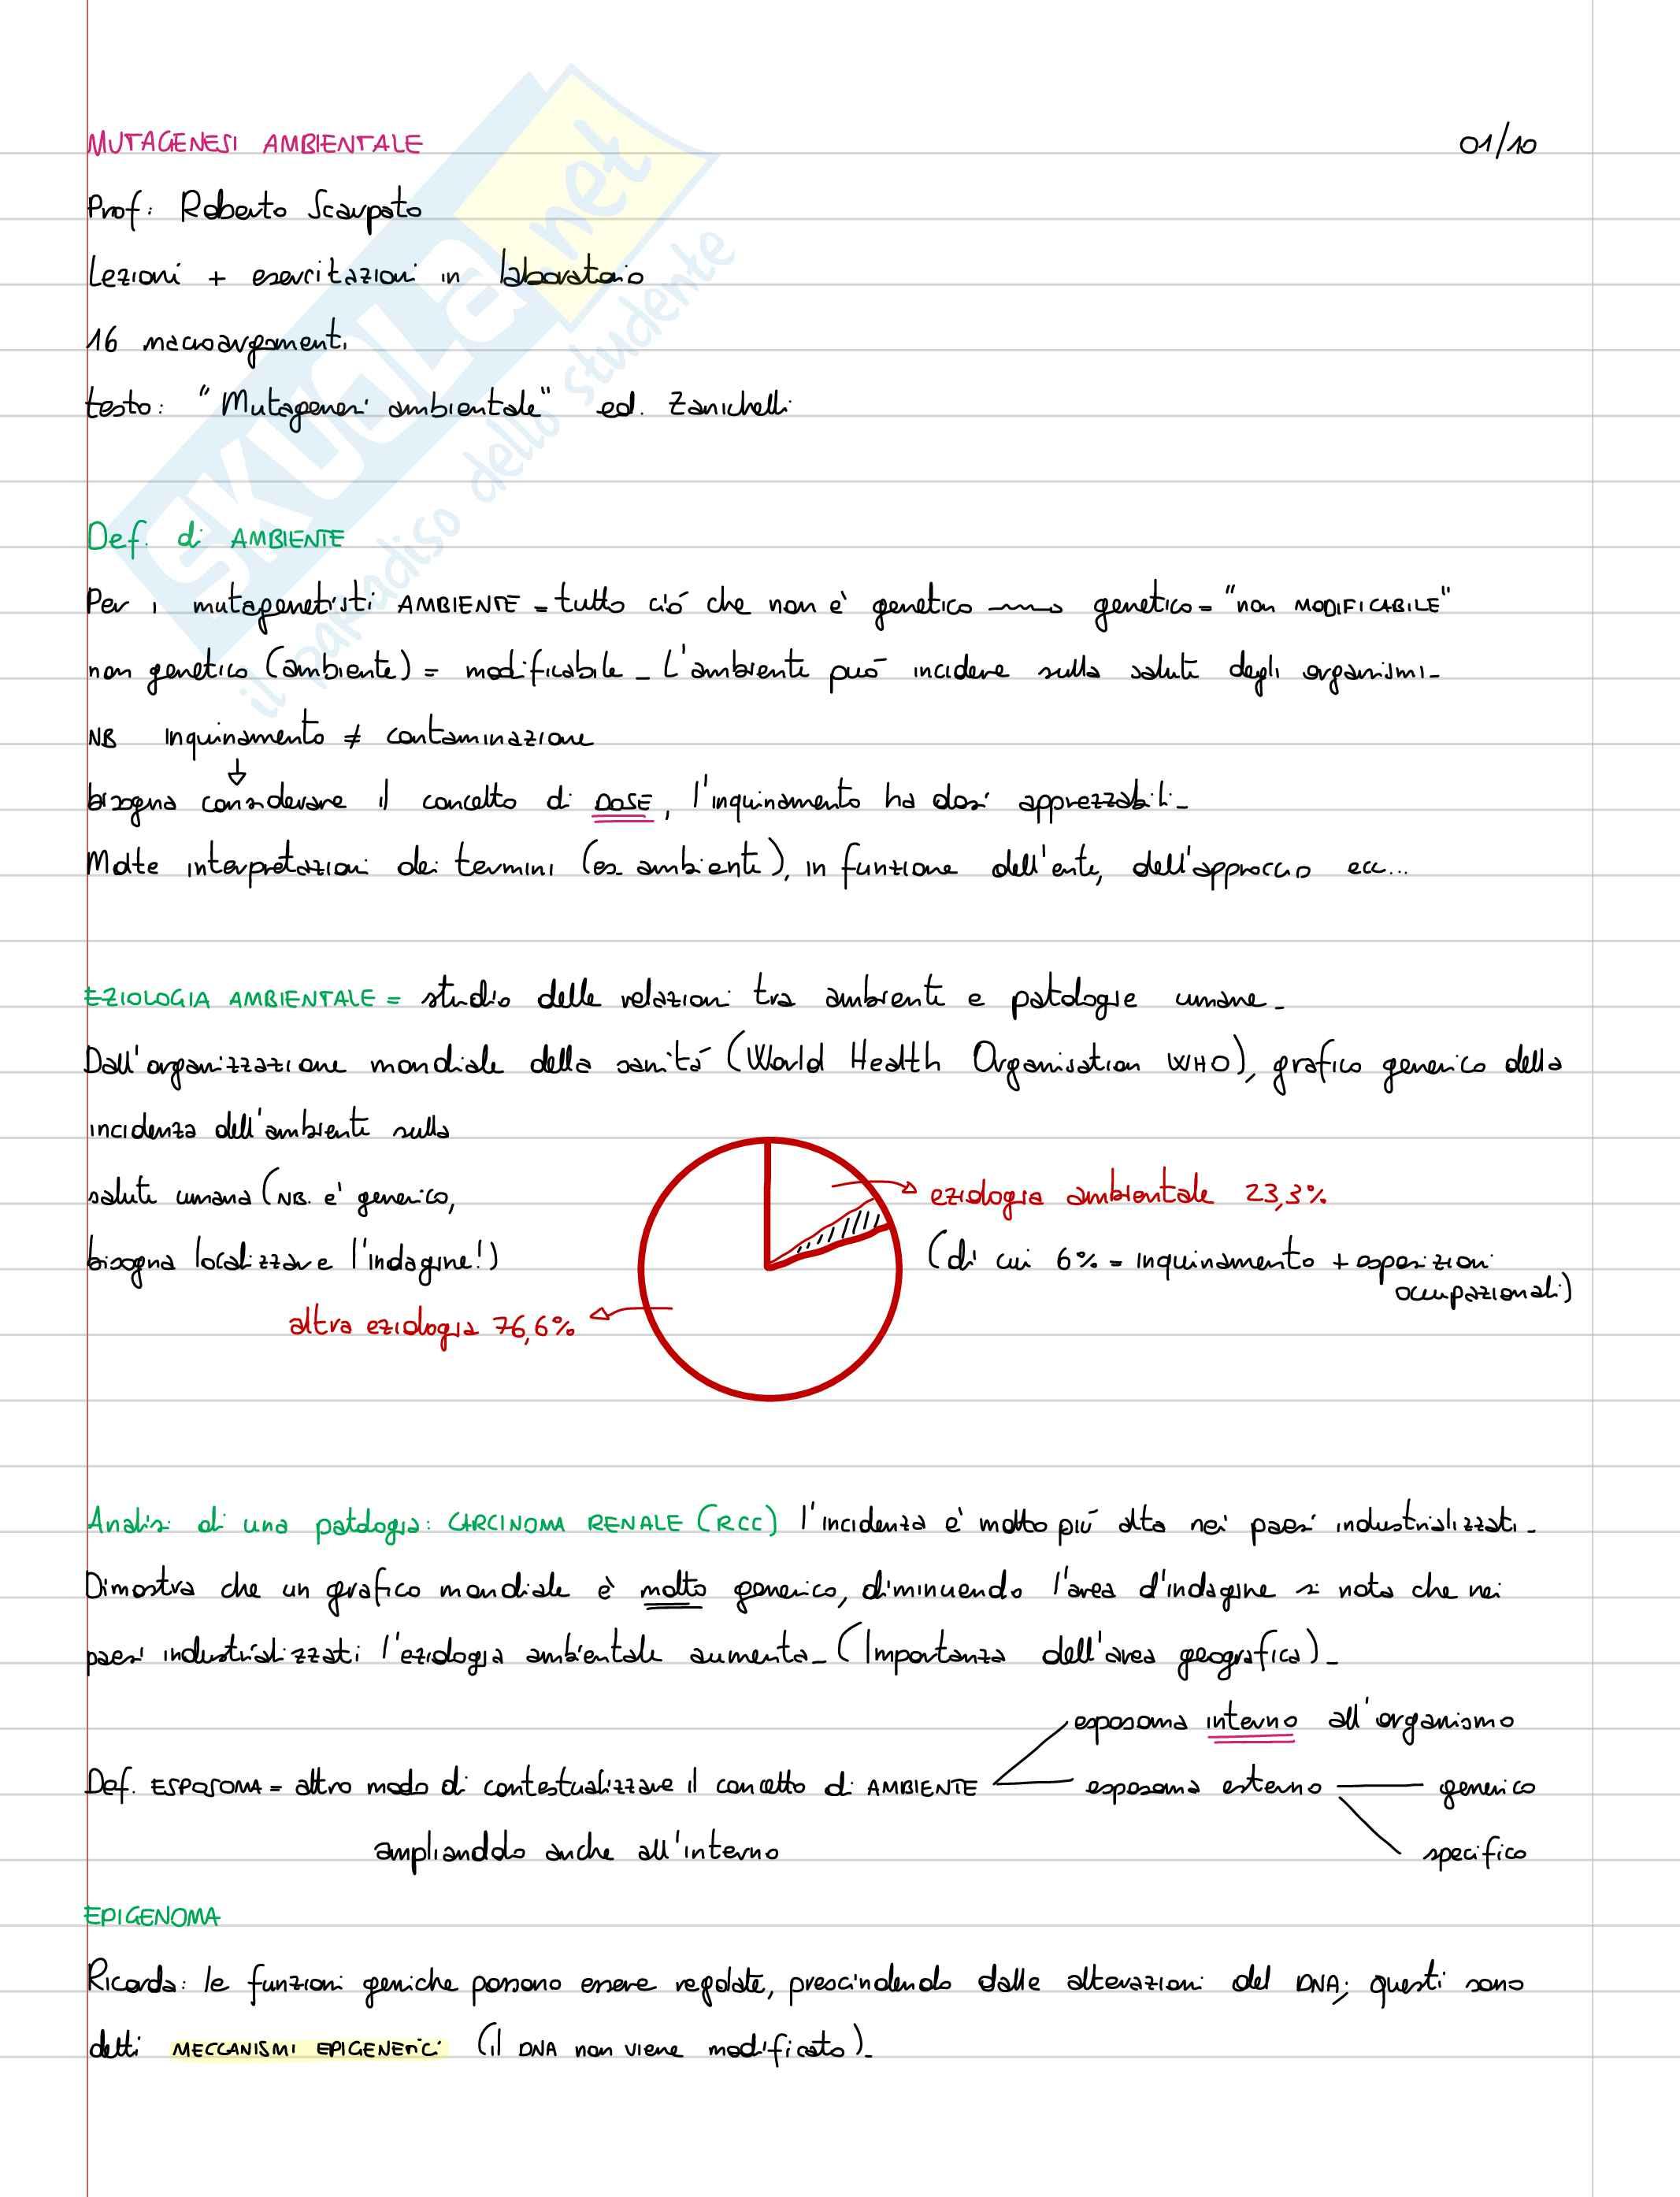 appunto R. Scarpato Mutagenesi Ambientale